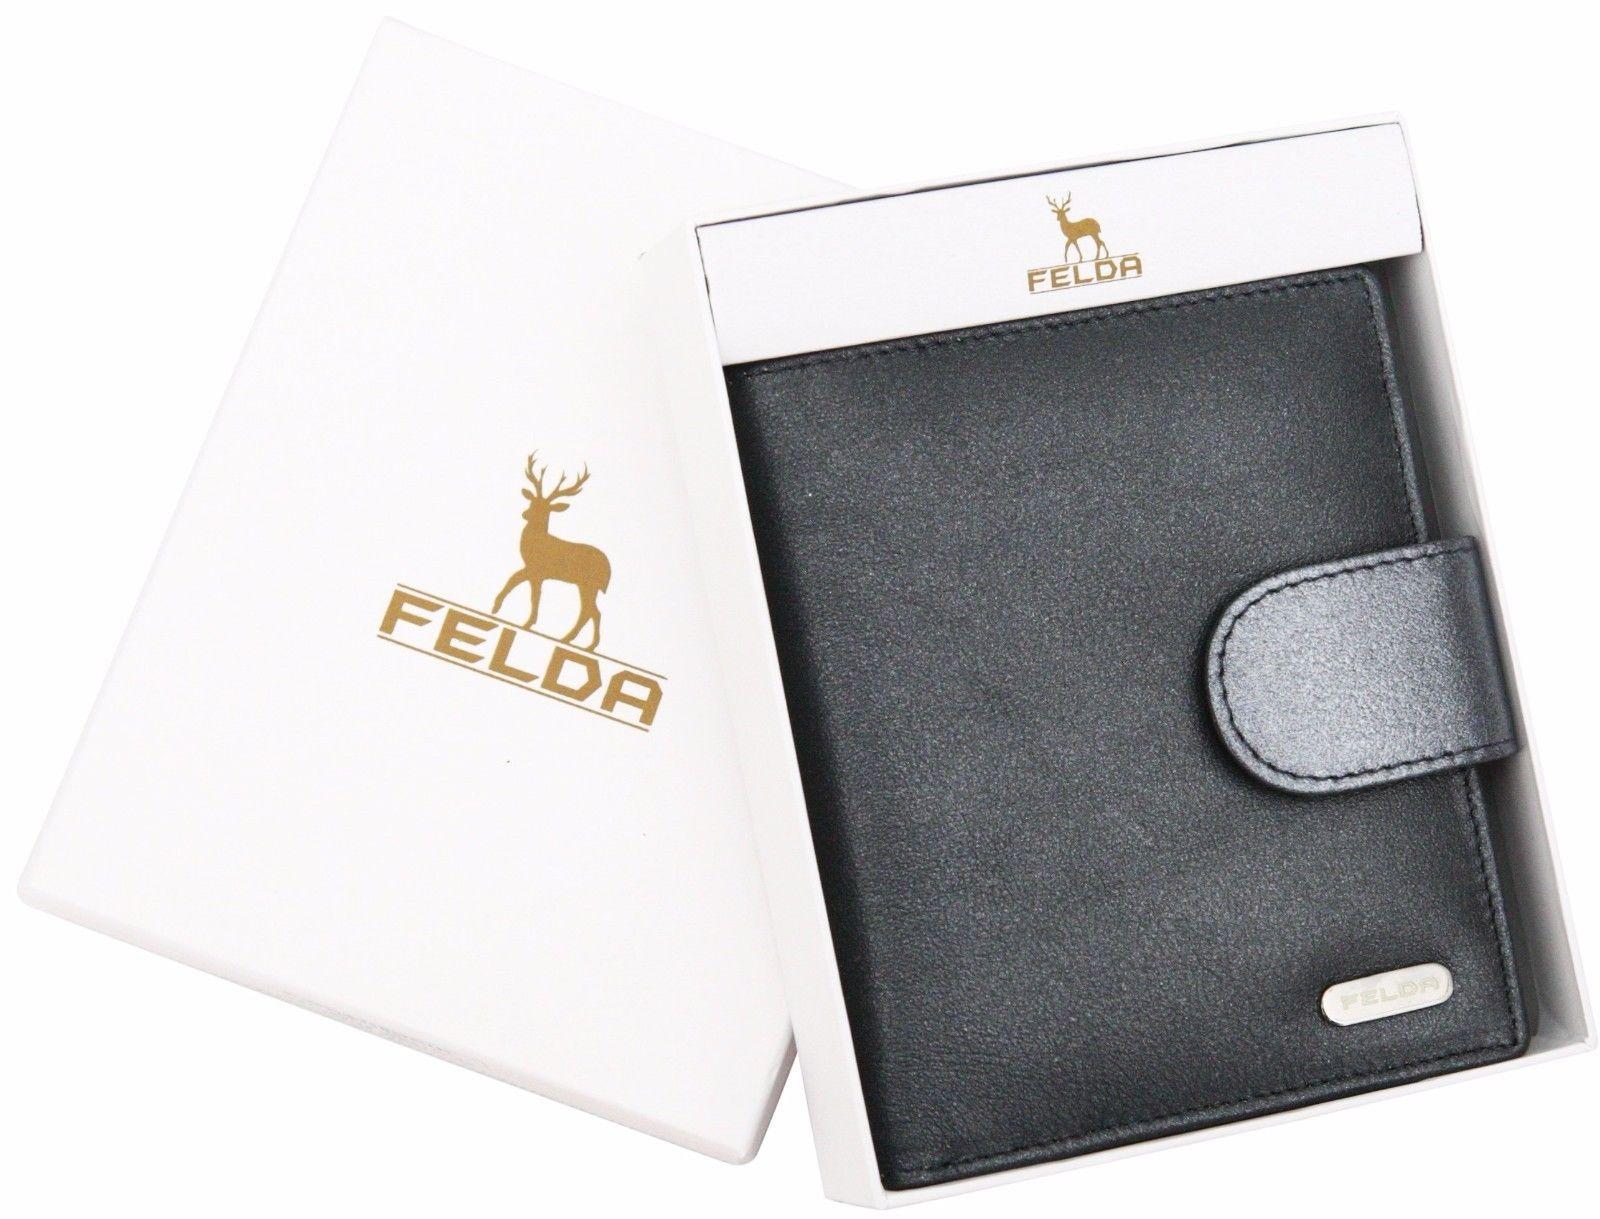 Felda-RFID-onorevoli-MEDAGLIA-amp-Card-Purse-Wallet-Genuine-Leather-Multi-SOFT-BOX-REGALO miniatura 49